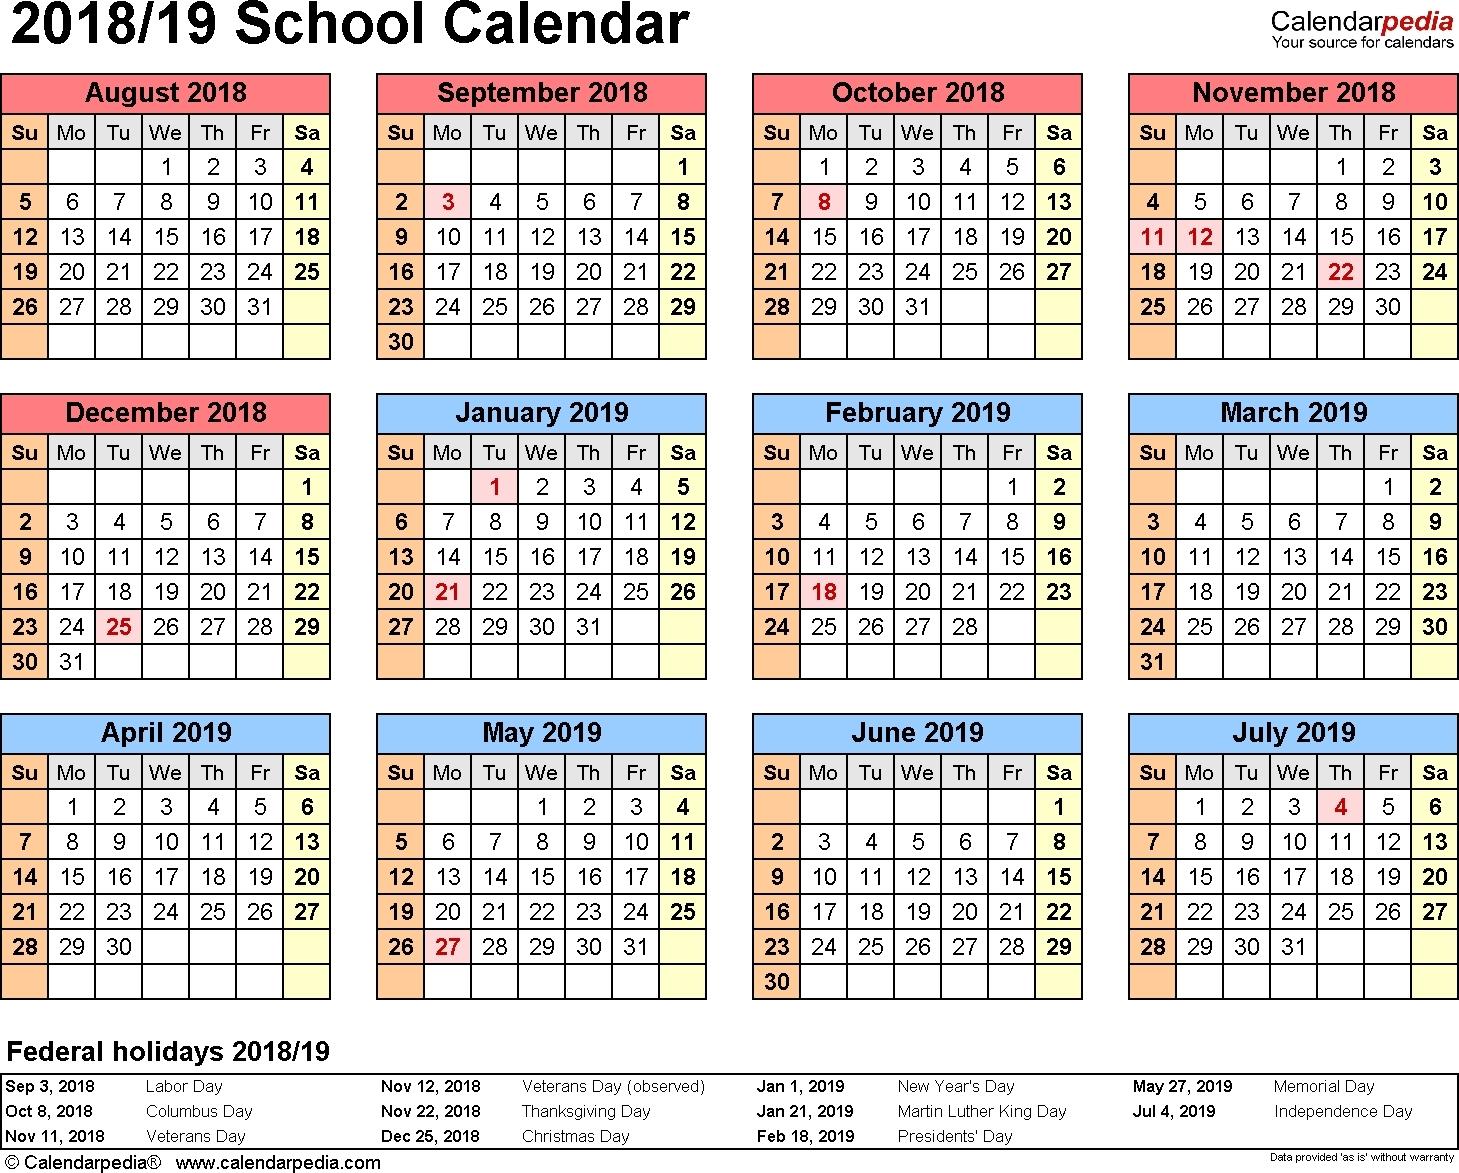 School Calendars 2018/2019 As Free Printable Word Templates-Unit 4_Unit 4 School Calendar